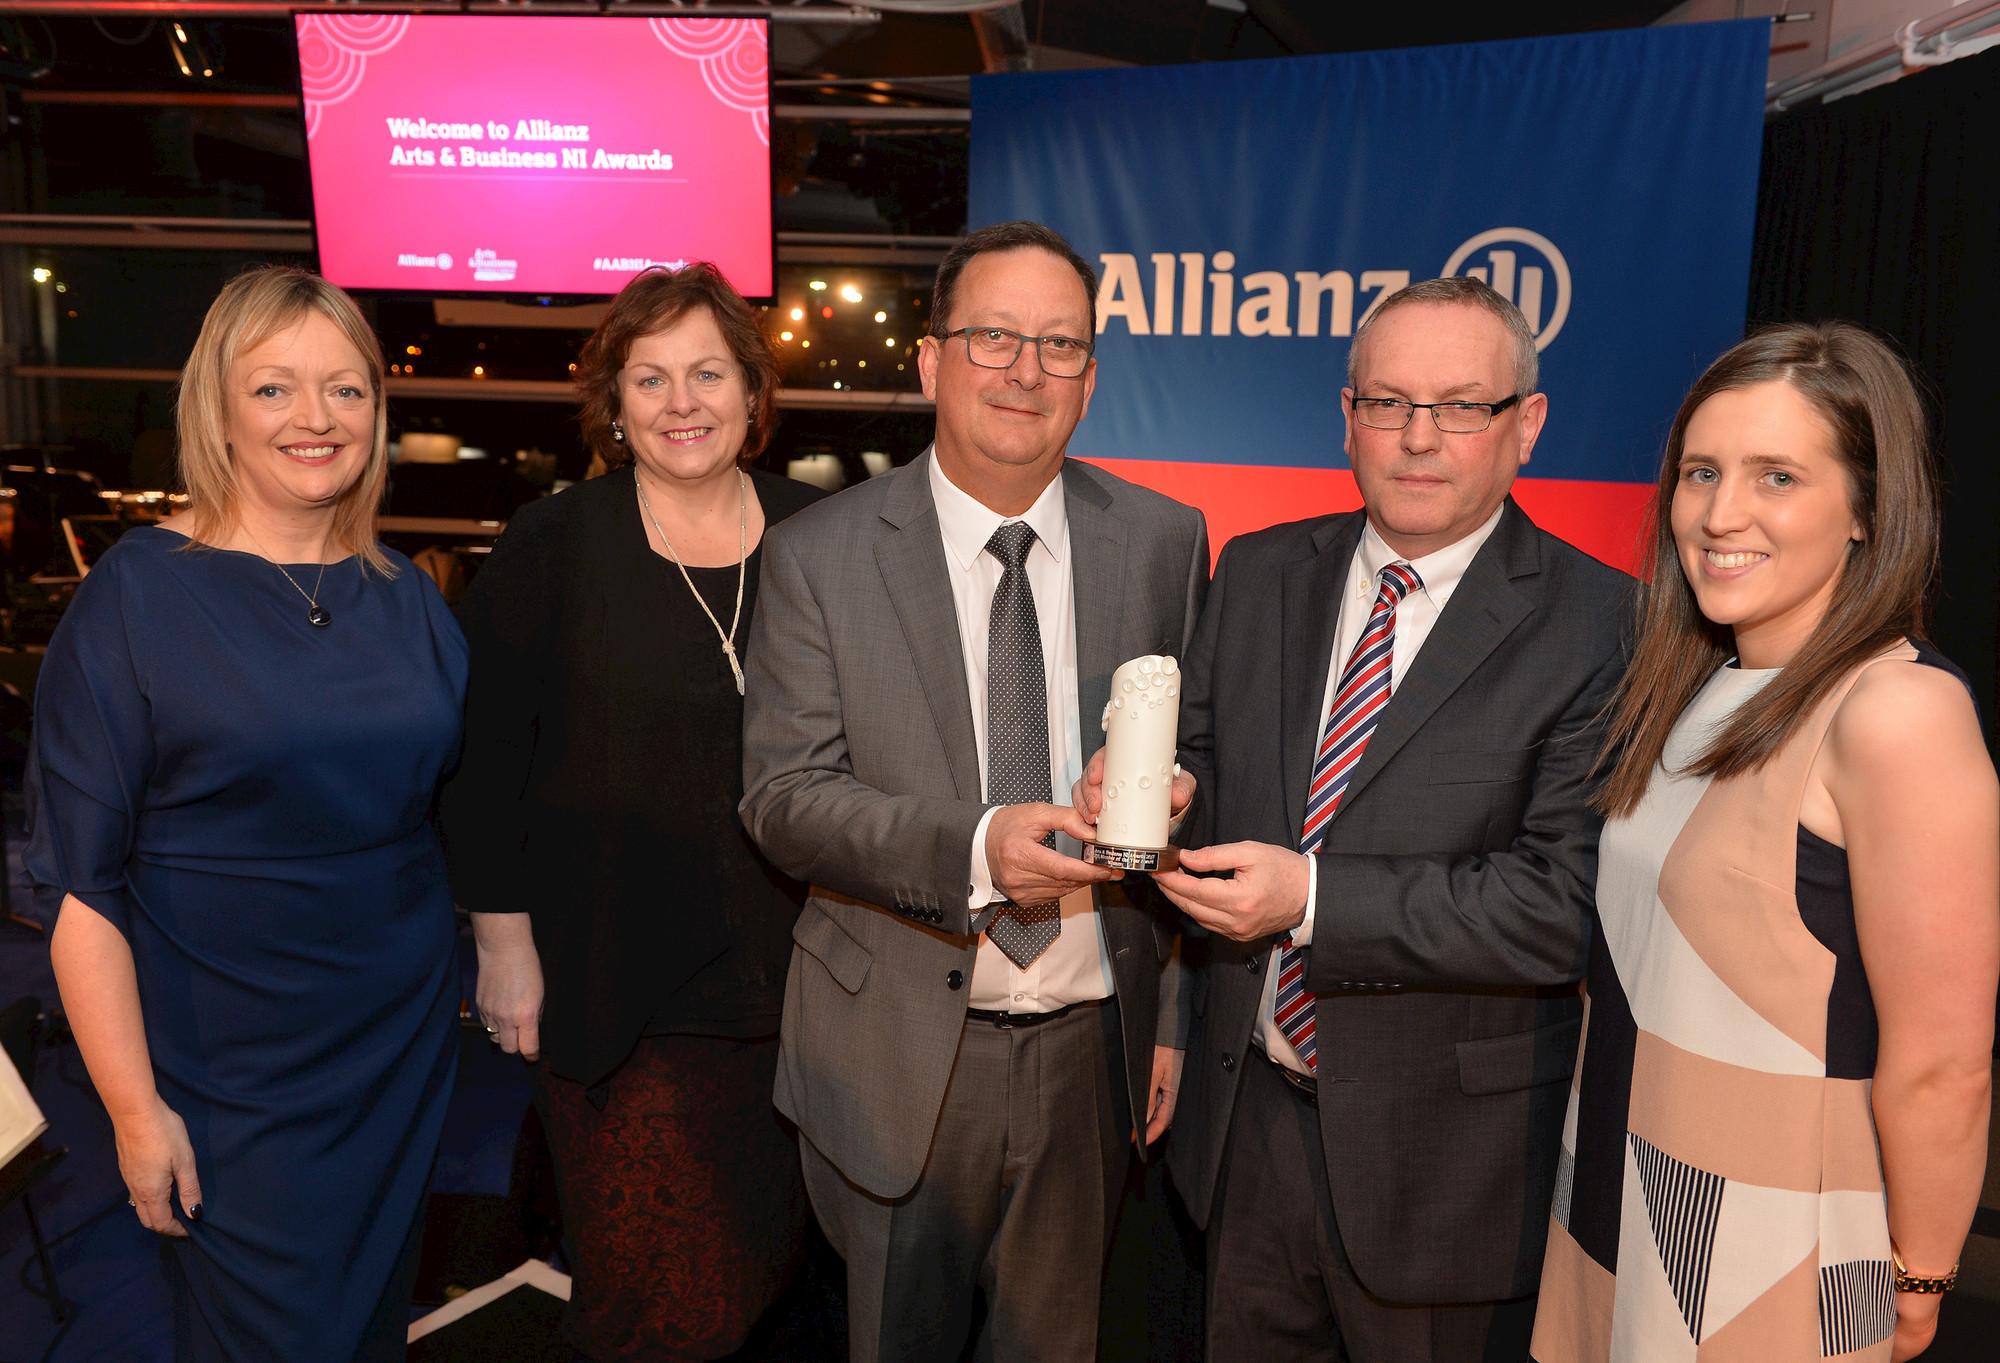 Allianz A&B NI Awards '17 - Wendy Ward, JTI, Mary and Joanne.jpg